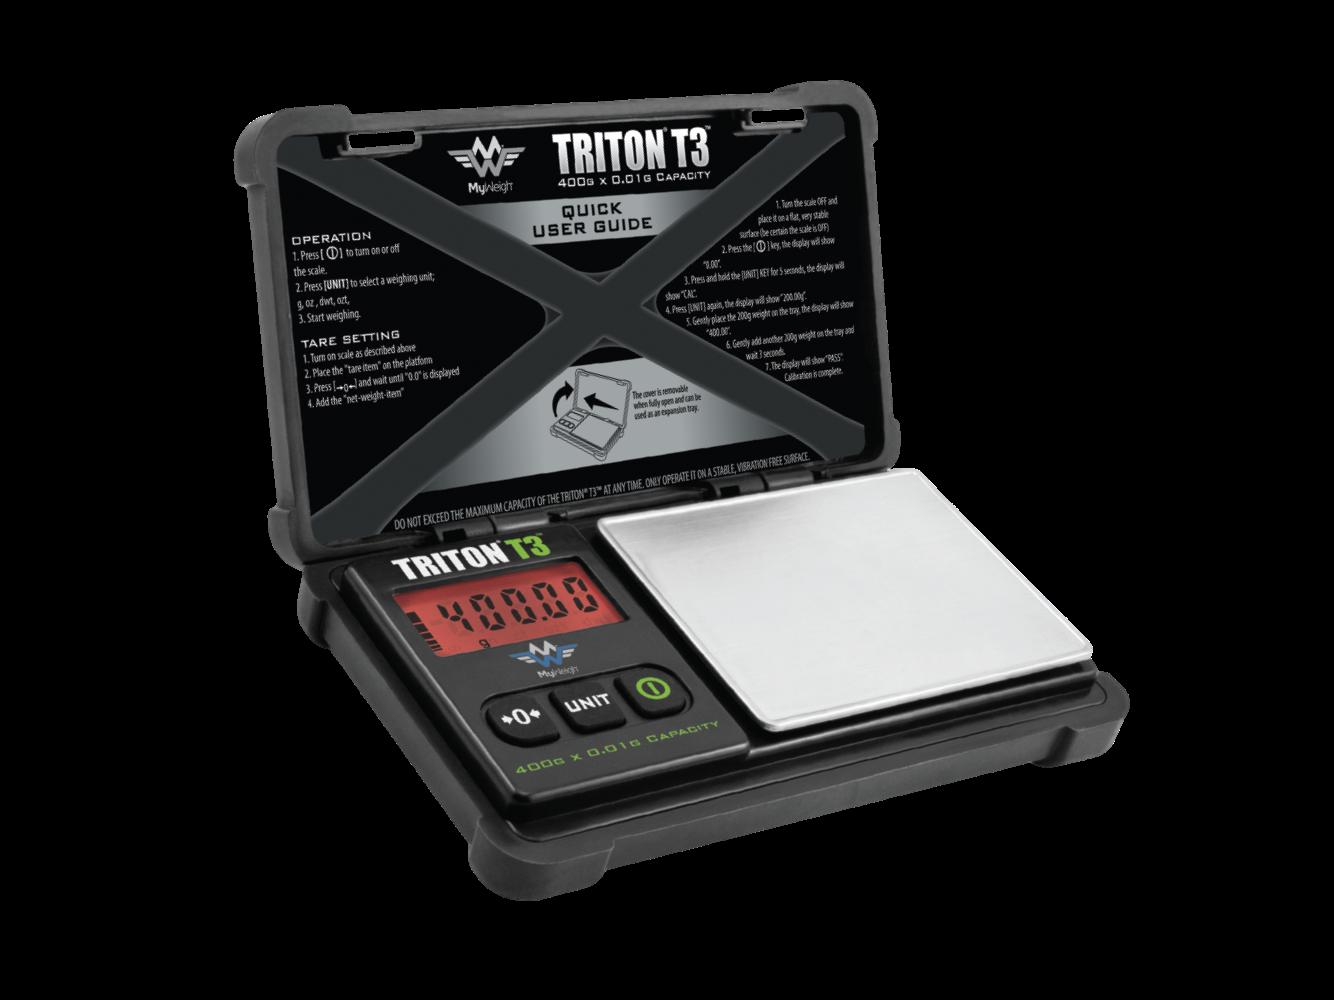 Triton T3 400 gx 0.01g